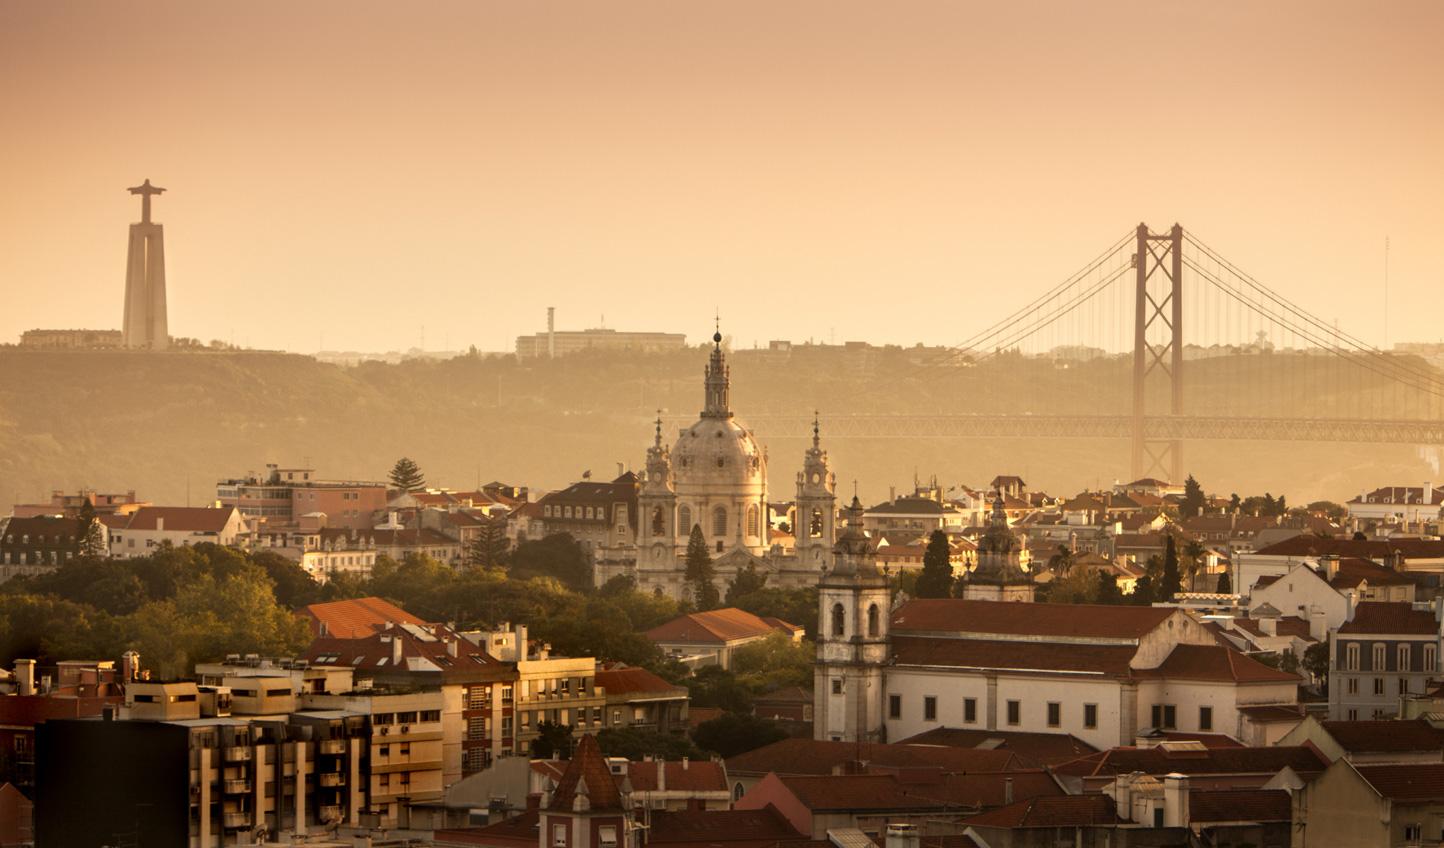 Catch a glimpse of the city's famous dusky pink hue